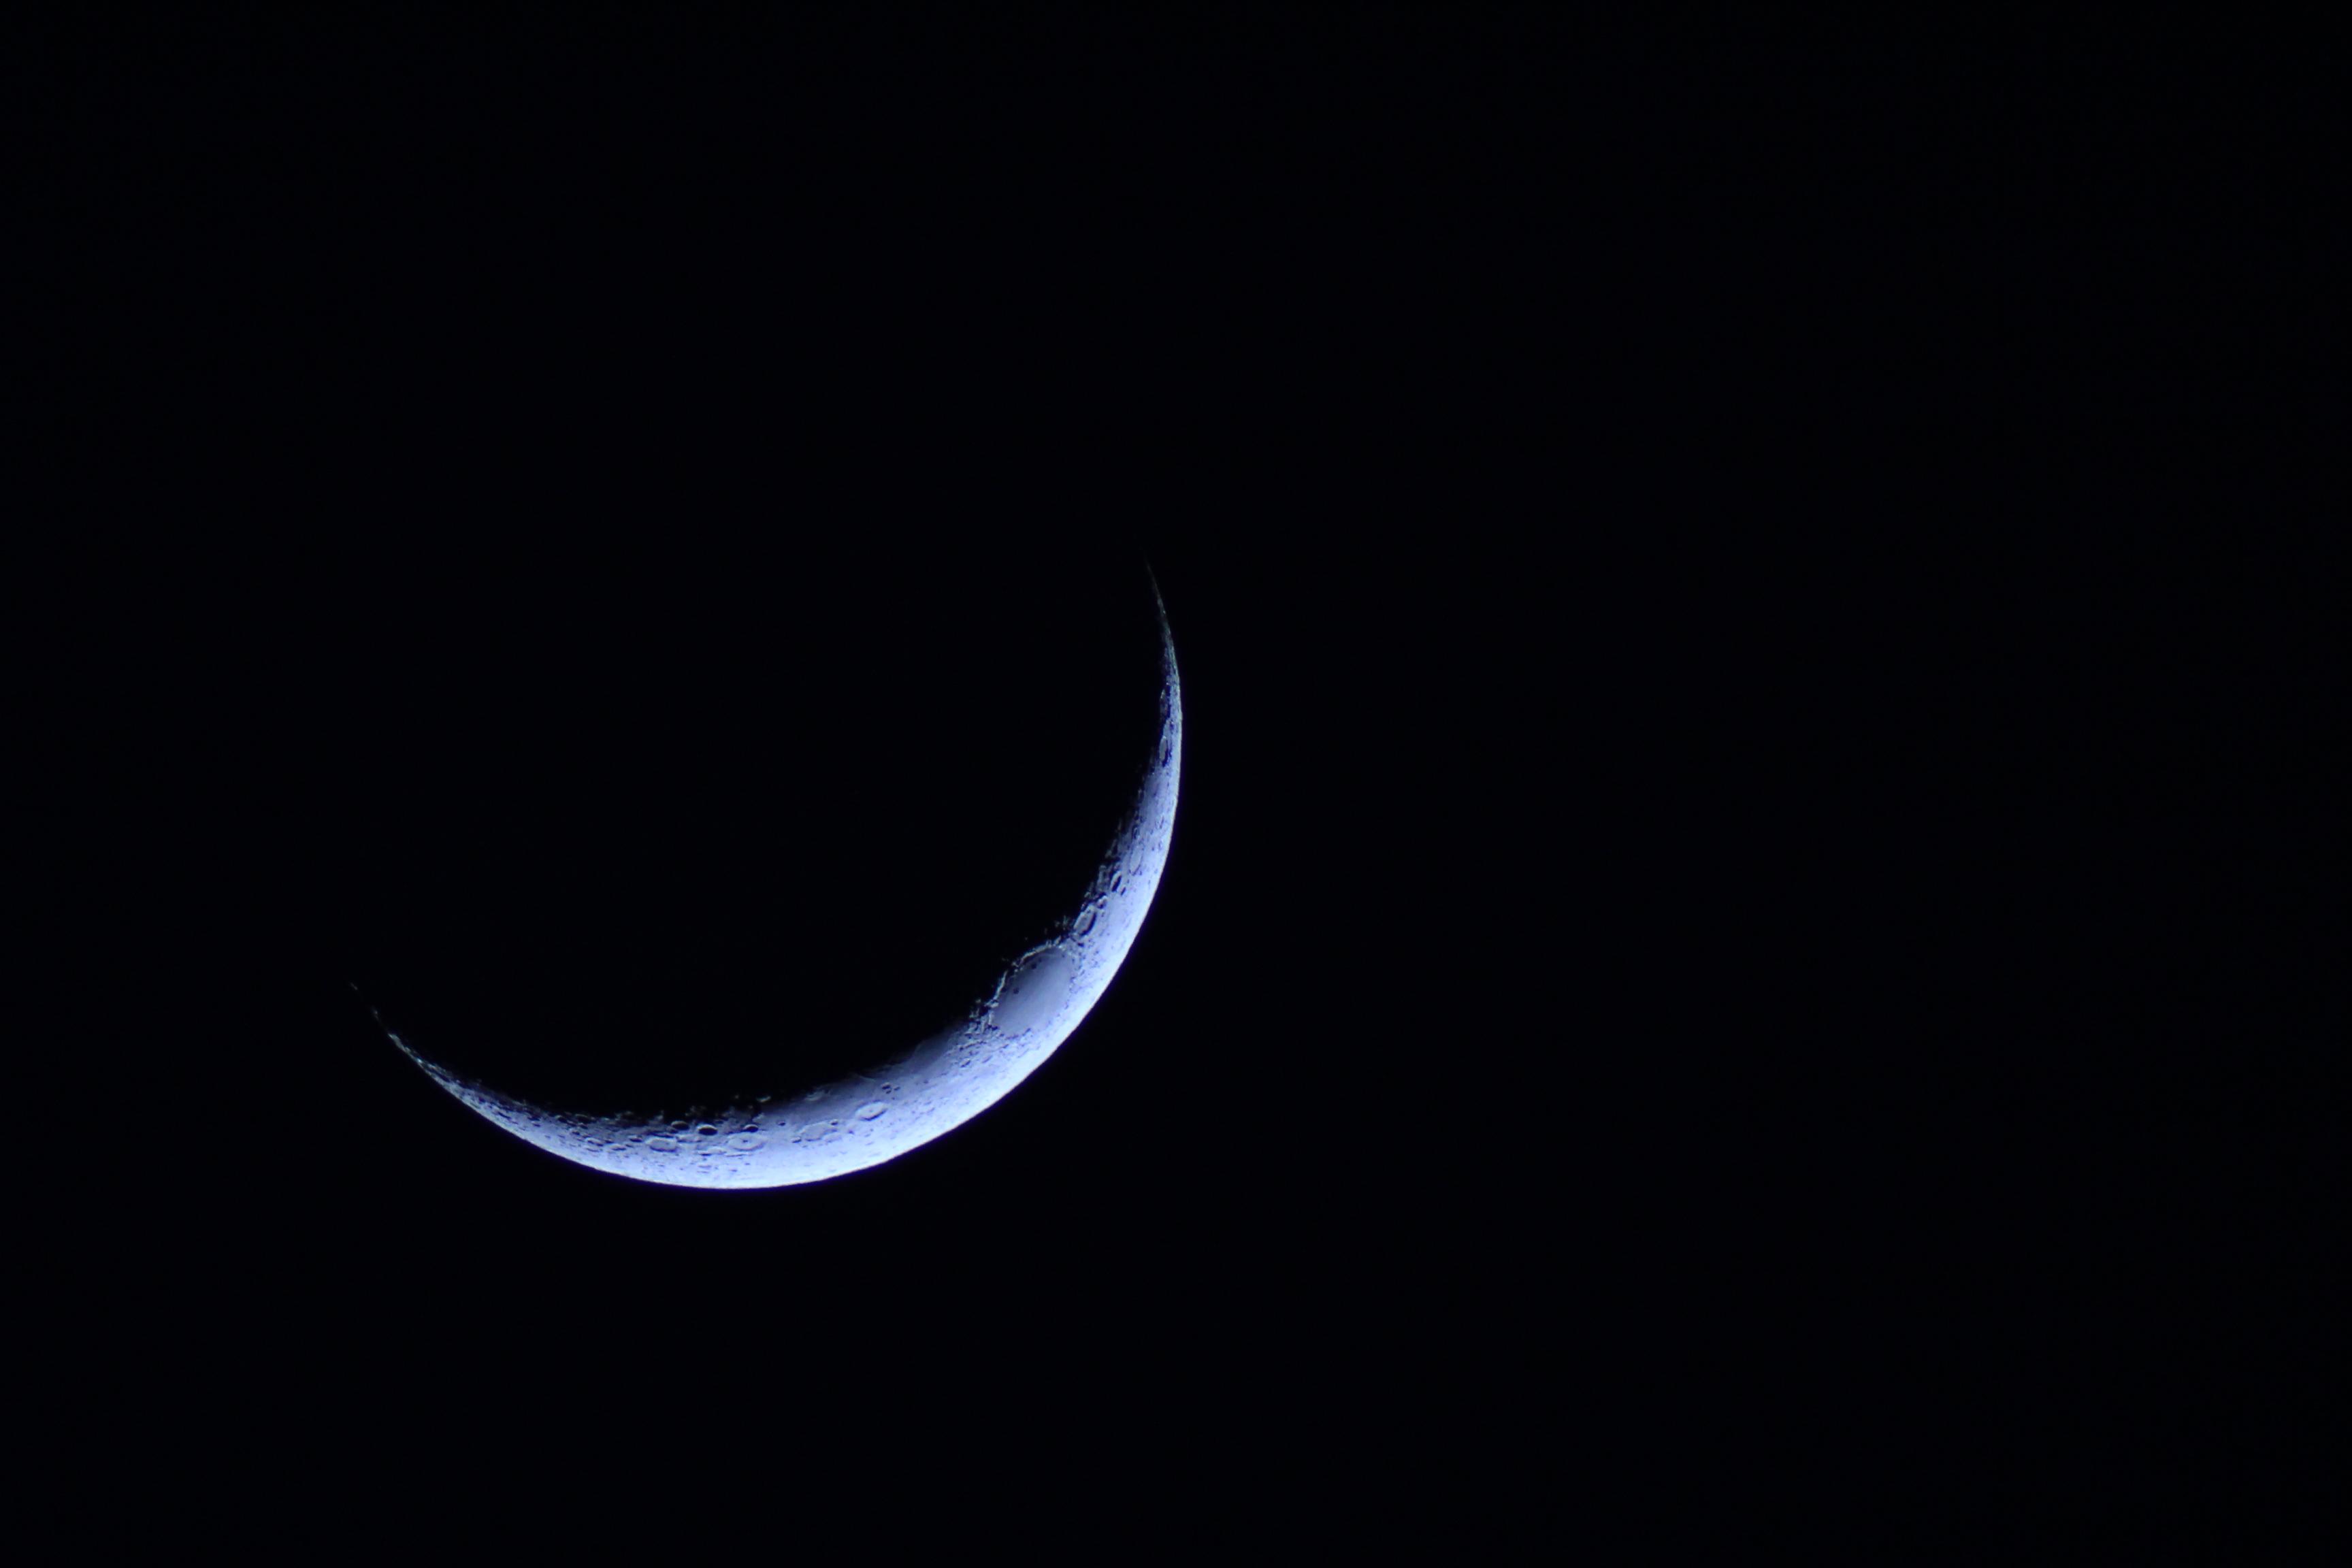 Ambassador Al-Sabah extends Ramadan greetings | Embassy of ...